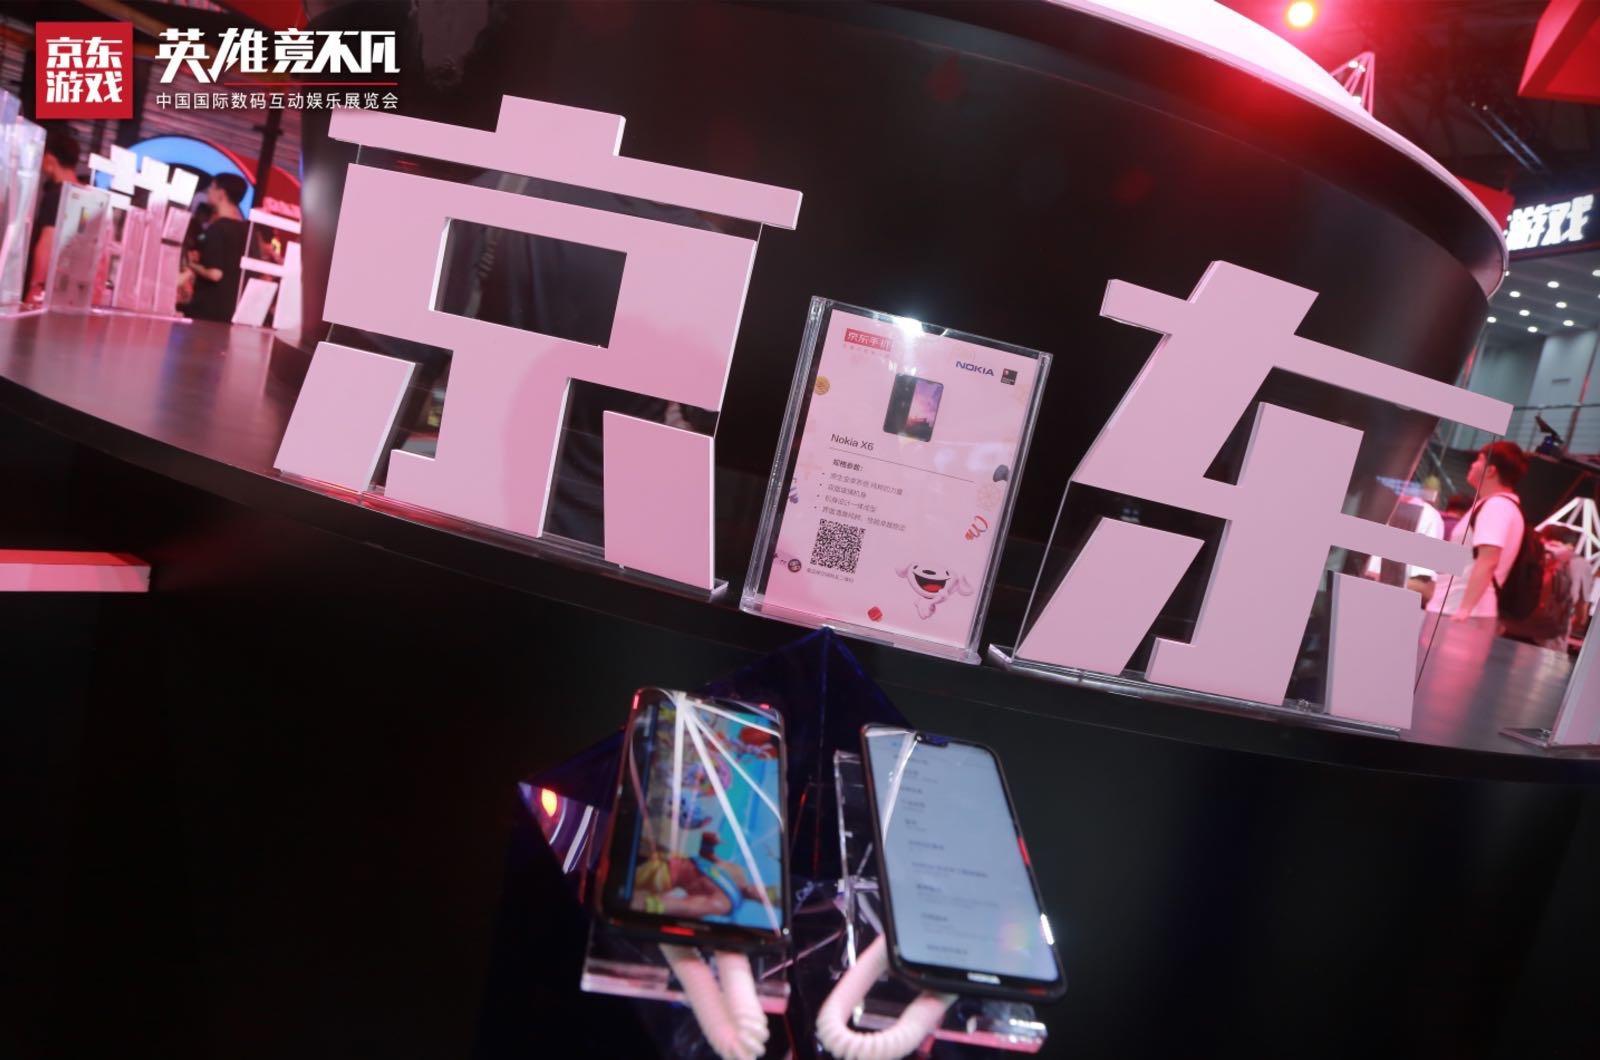 chinajoy不容错过的科技帝国,京东游戏展台玩的就是这么fun肆